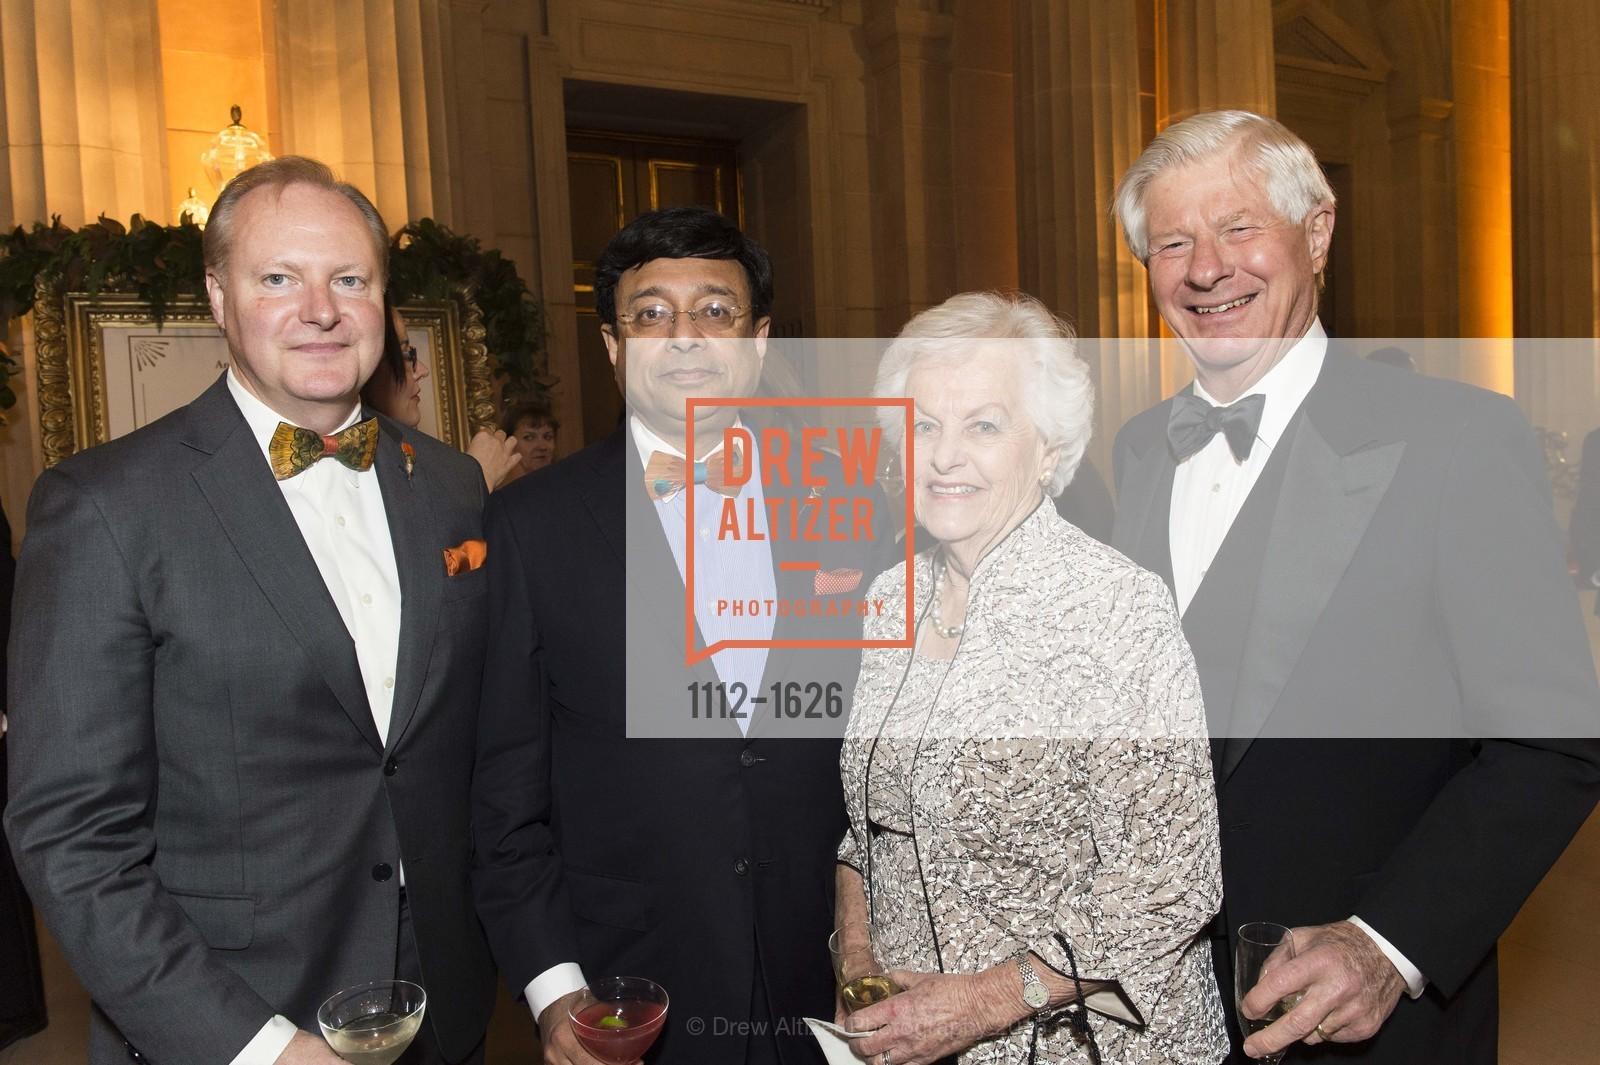 Brian James, Shariq Yosufzai, Peggy Nute, Boyce Nute, Photo #1112-1626